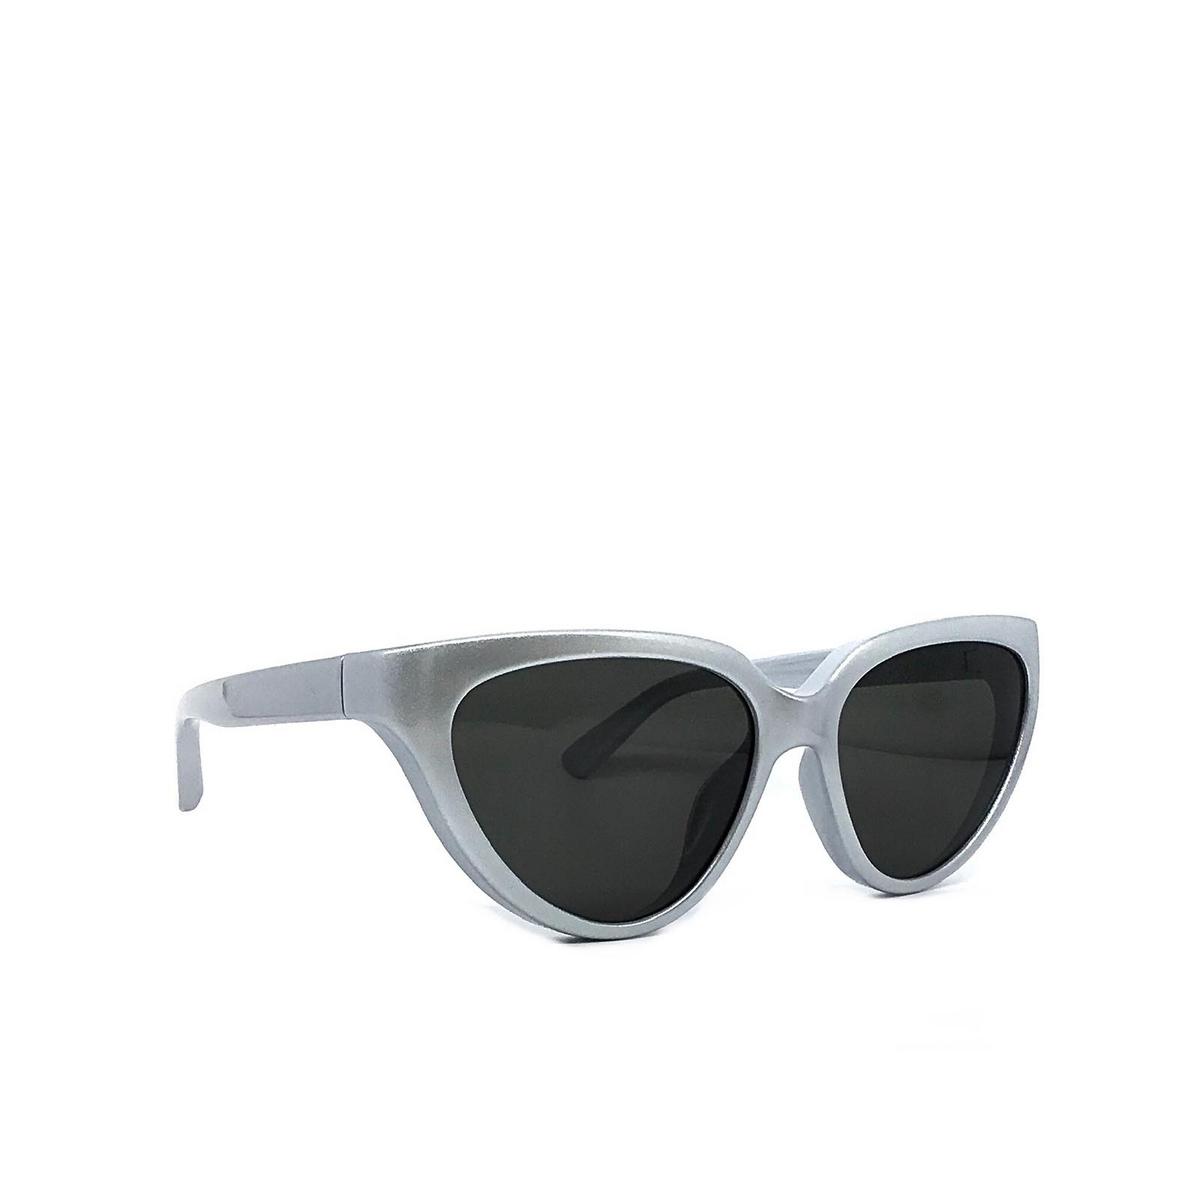 Balenciaga® Cat-eye Sunglasses: BB0149S color Silver 003 - three-quarters view.